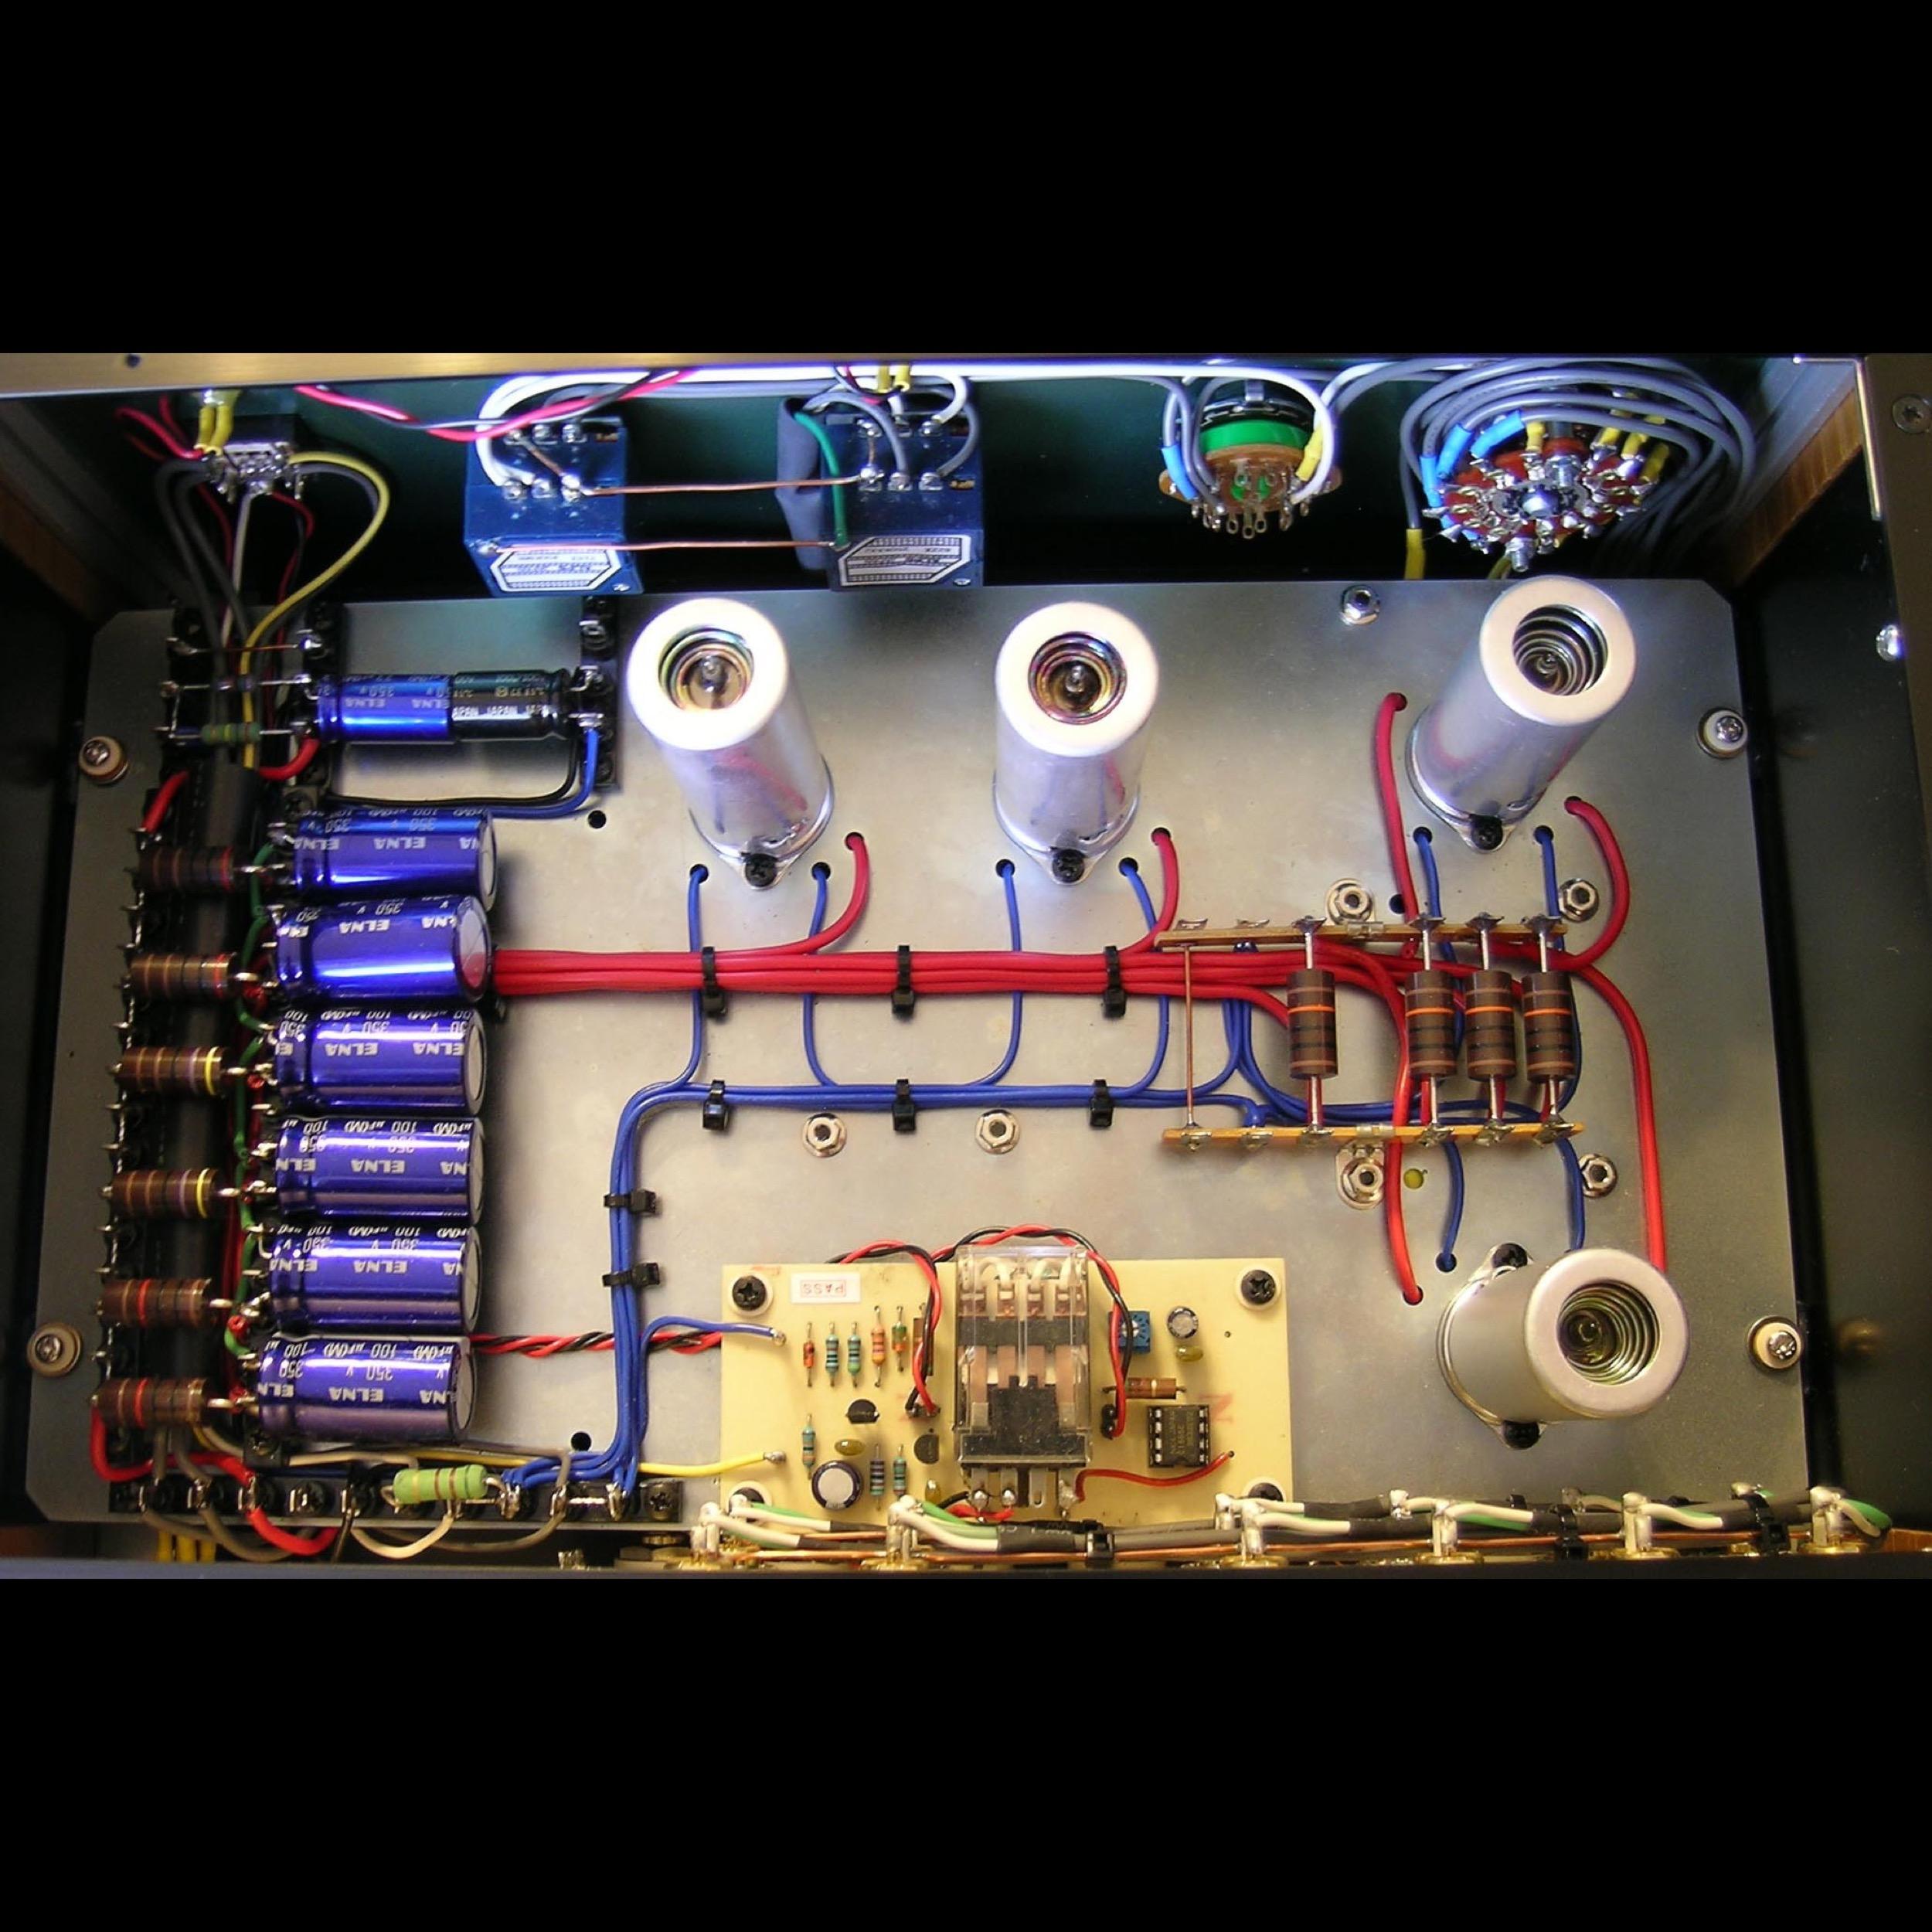 Vintage HiFi Club Leben CS 600 - Integrated Amplifier